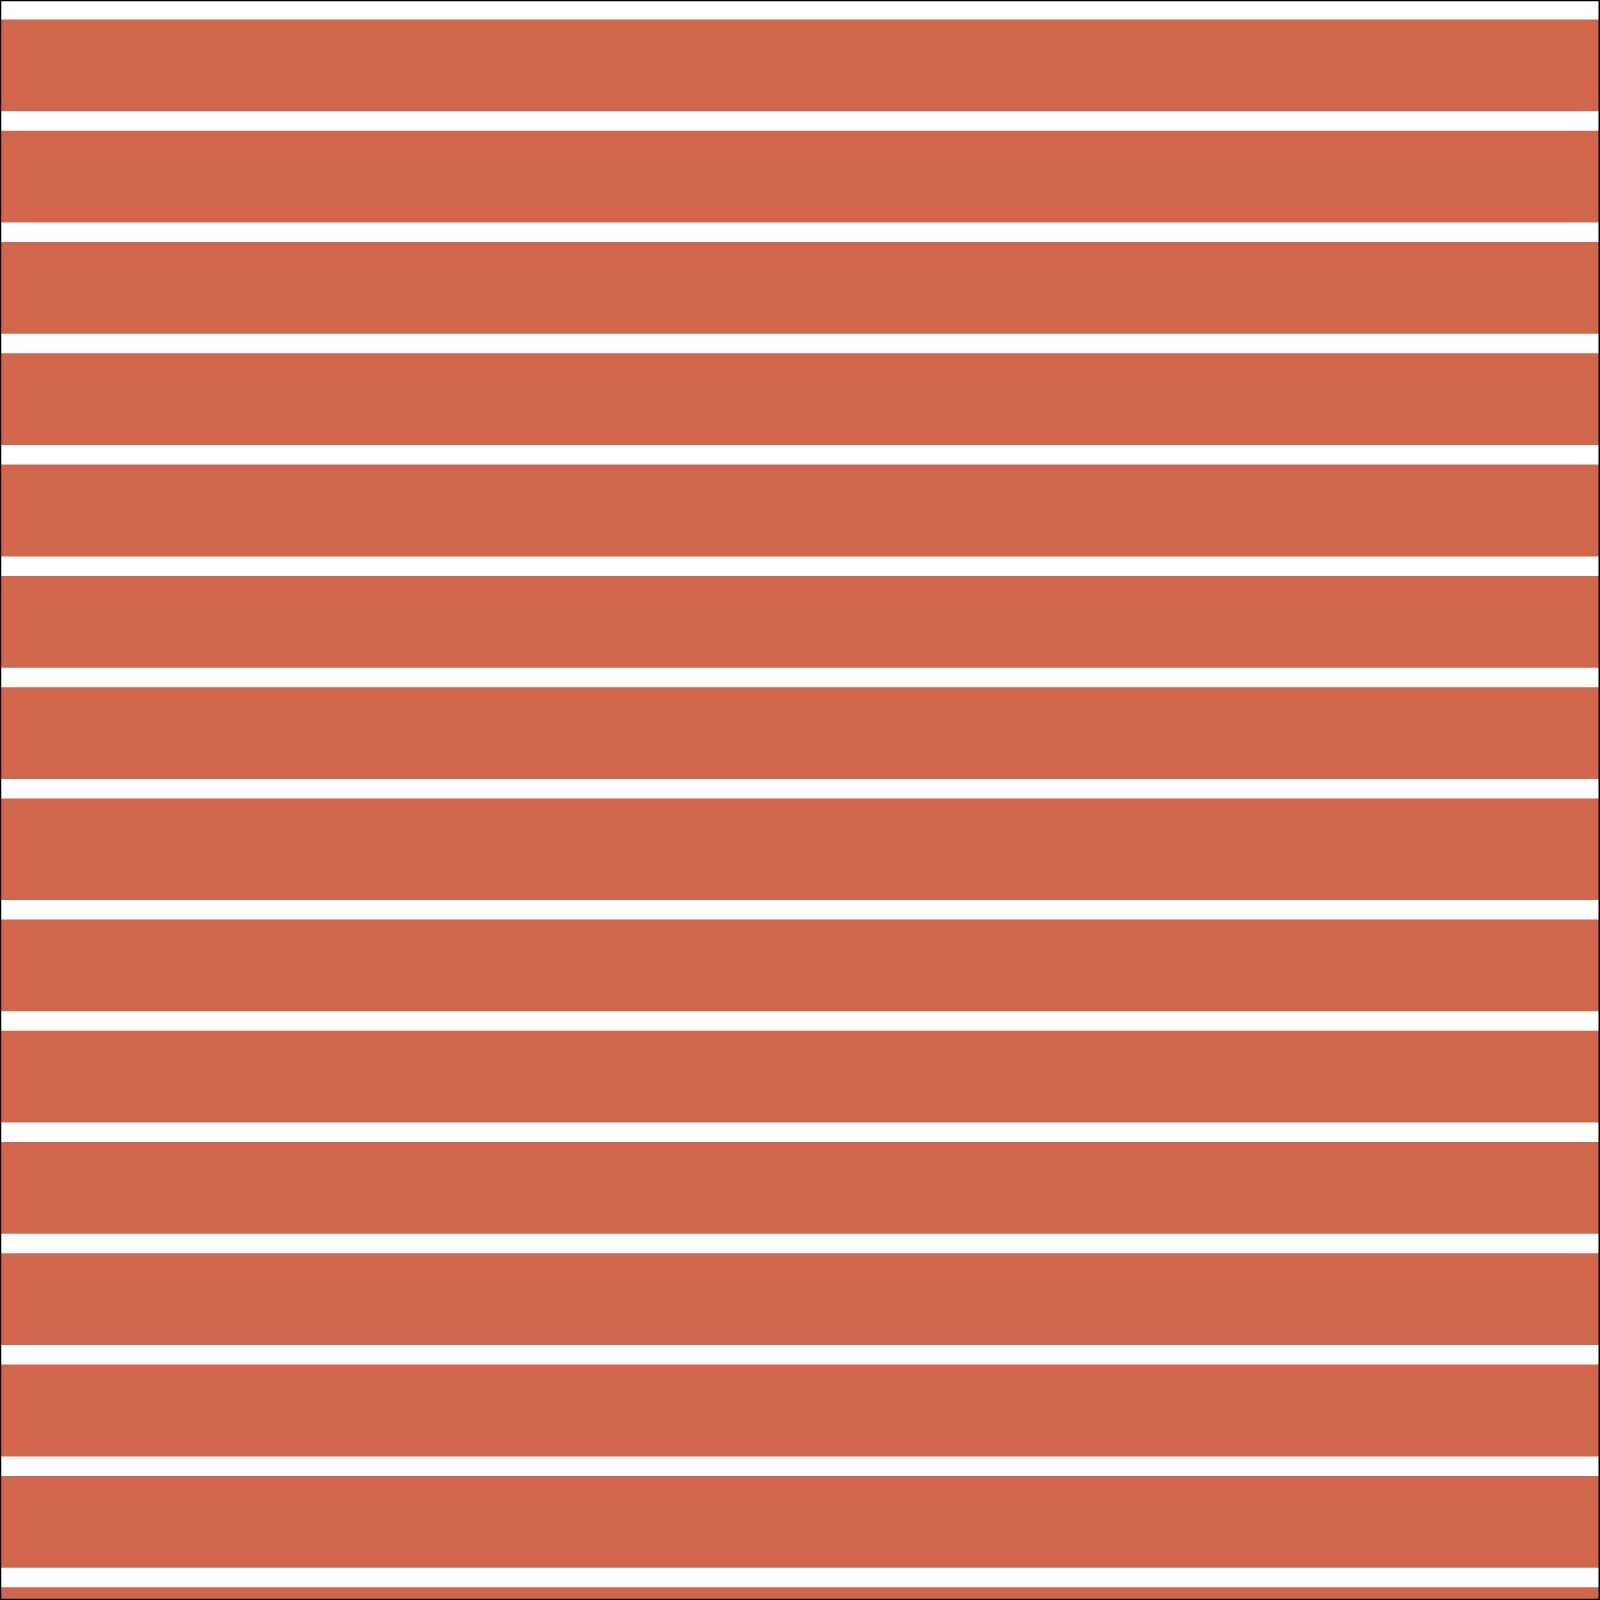 Red & White Stripes Interlock Knit - Cloud 9 Organics